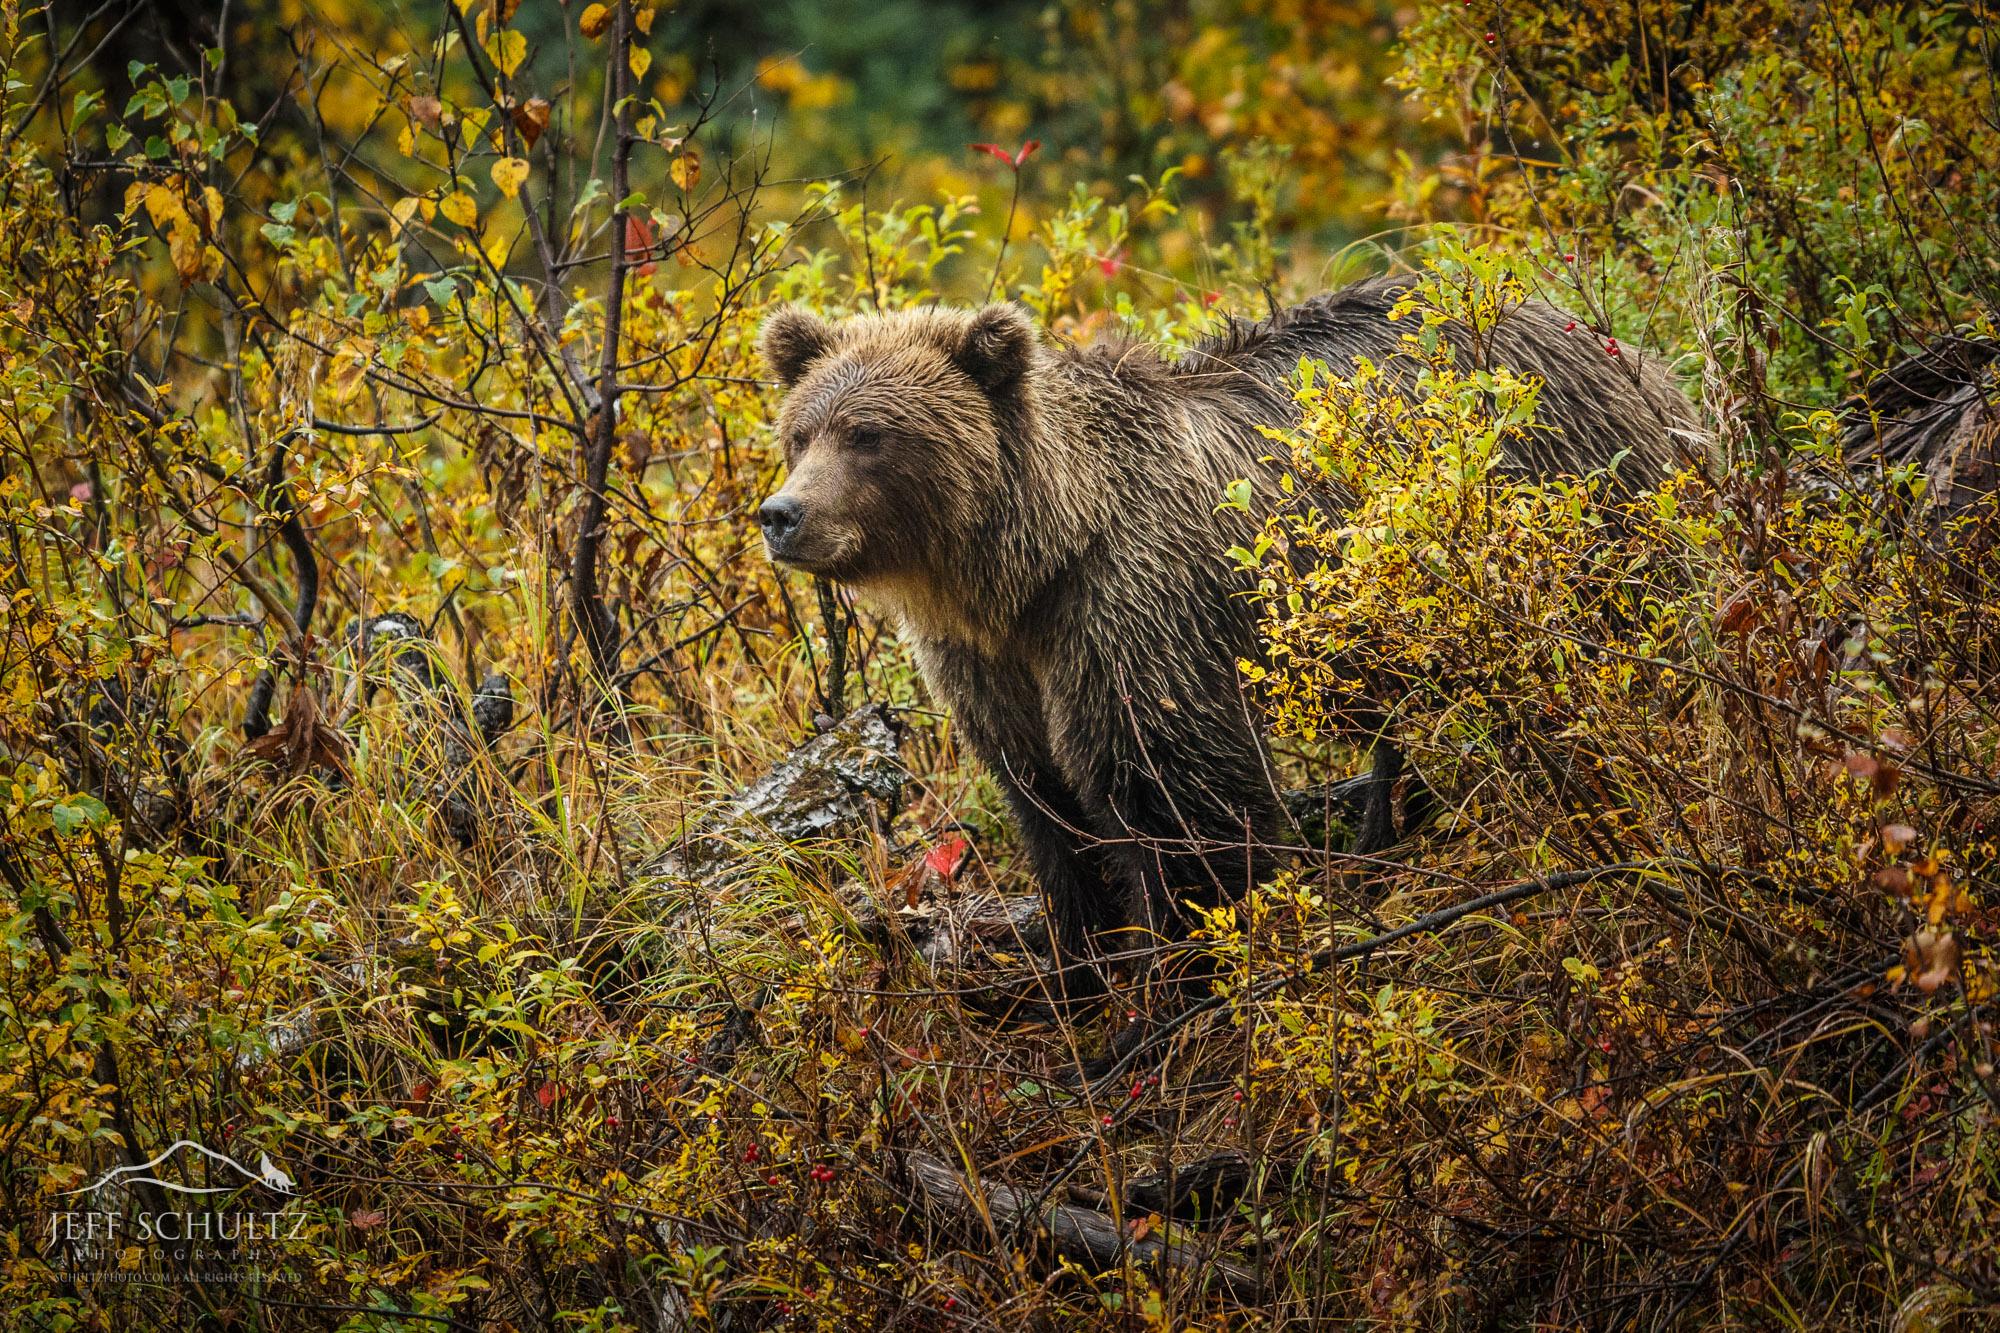 Alaska Wildlife Photography - Jeff Schultz